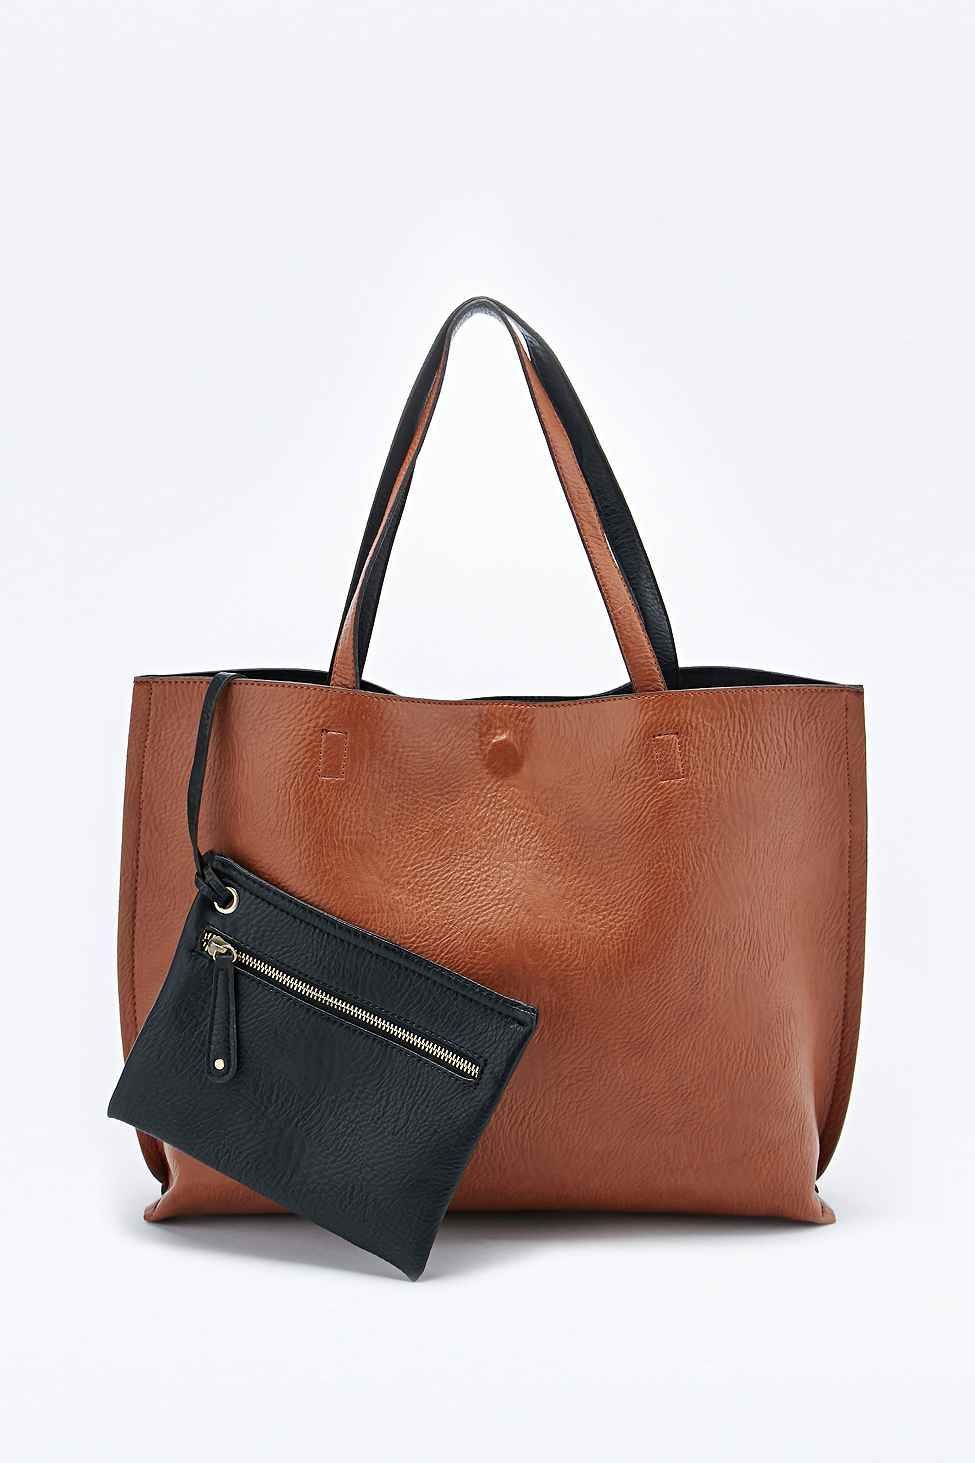 Leather Black Vegan Oversized Tote And In Bag Tan Reversible wv0yNOm8n